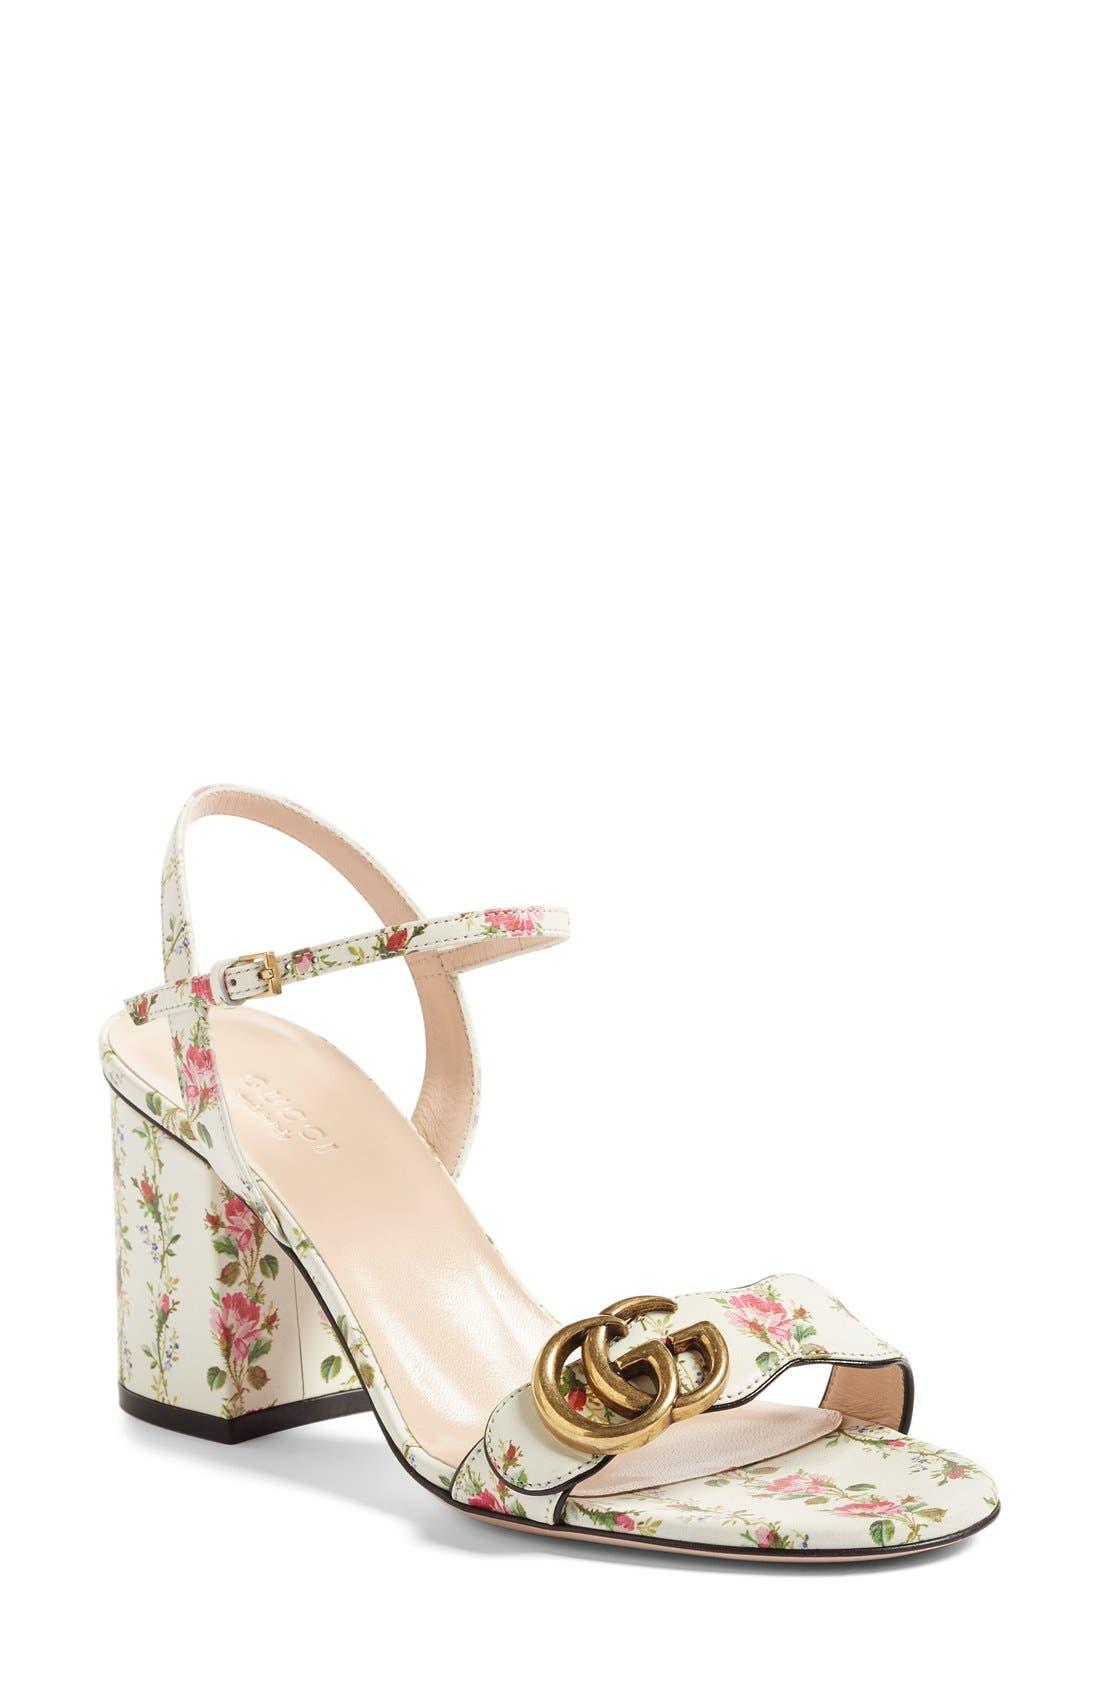 GG Marmont Block Heel Sandal,                         Main,                         color, White Floral